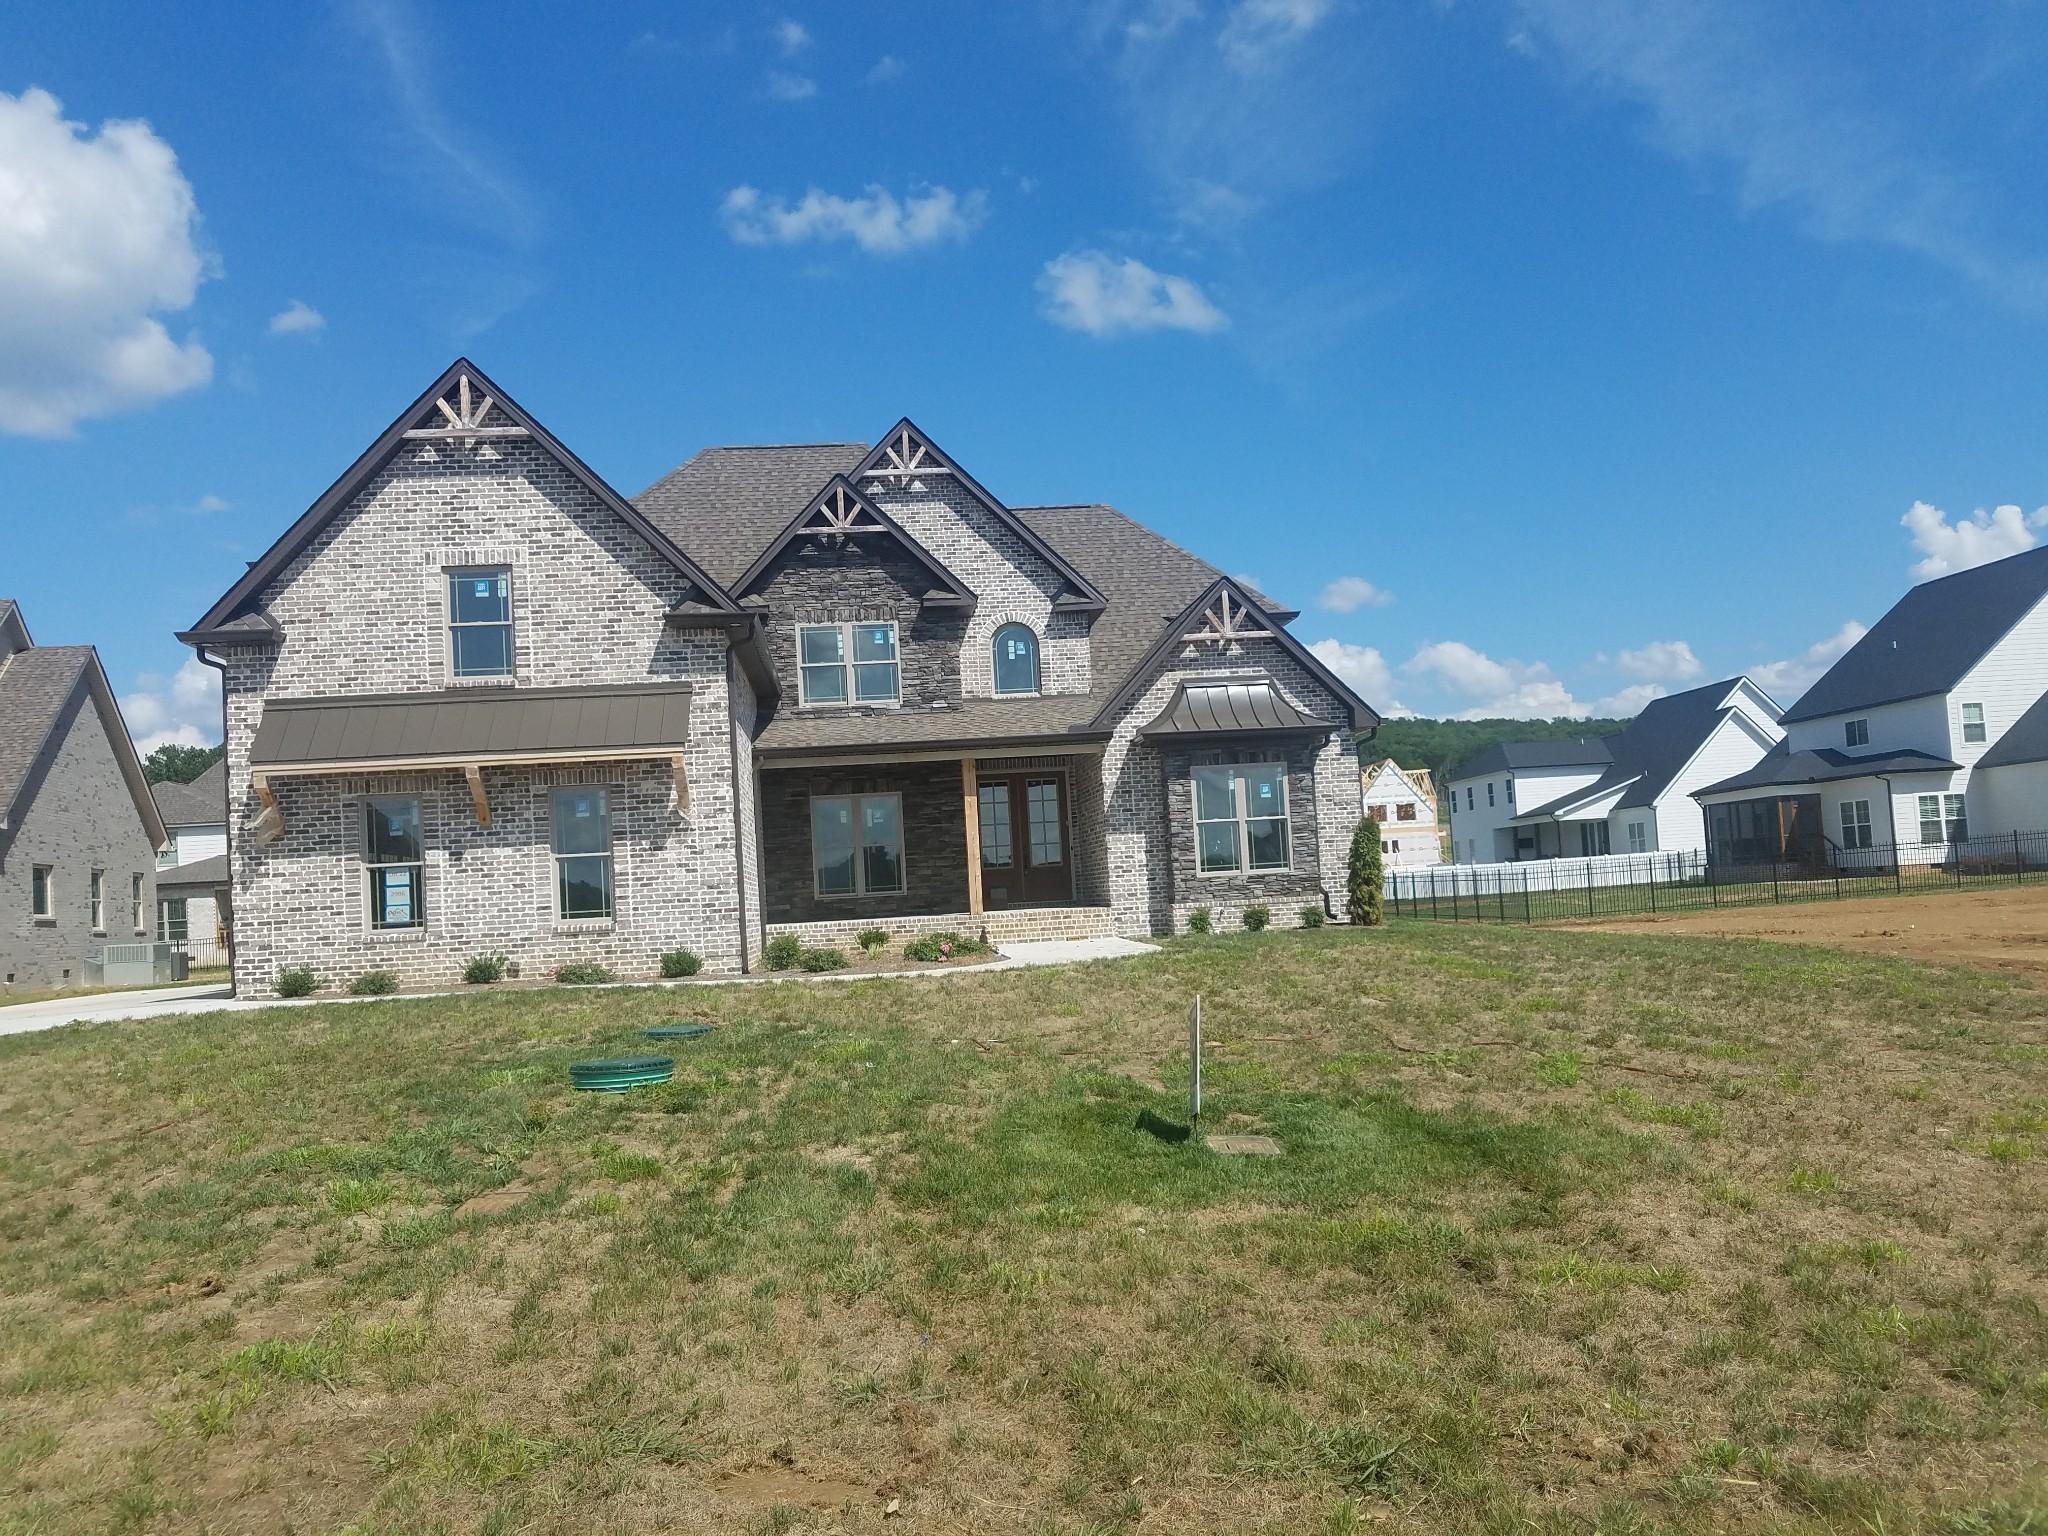 2906 Cooper City Ct Property Photo - Murfreesboro, TN real estate listing